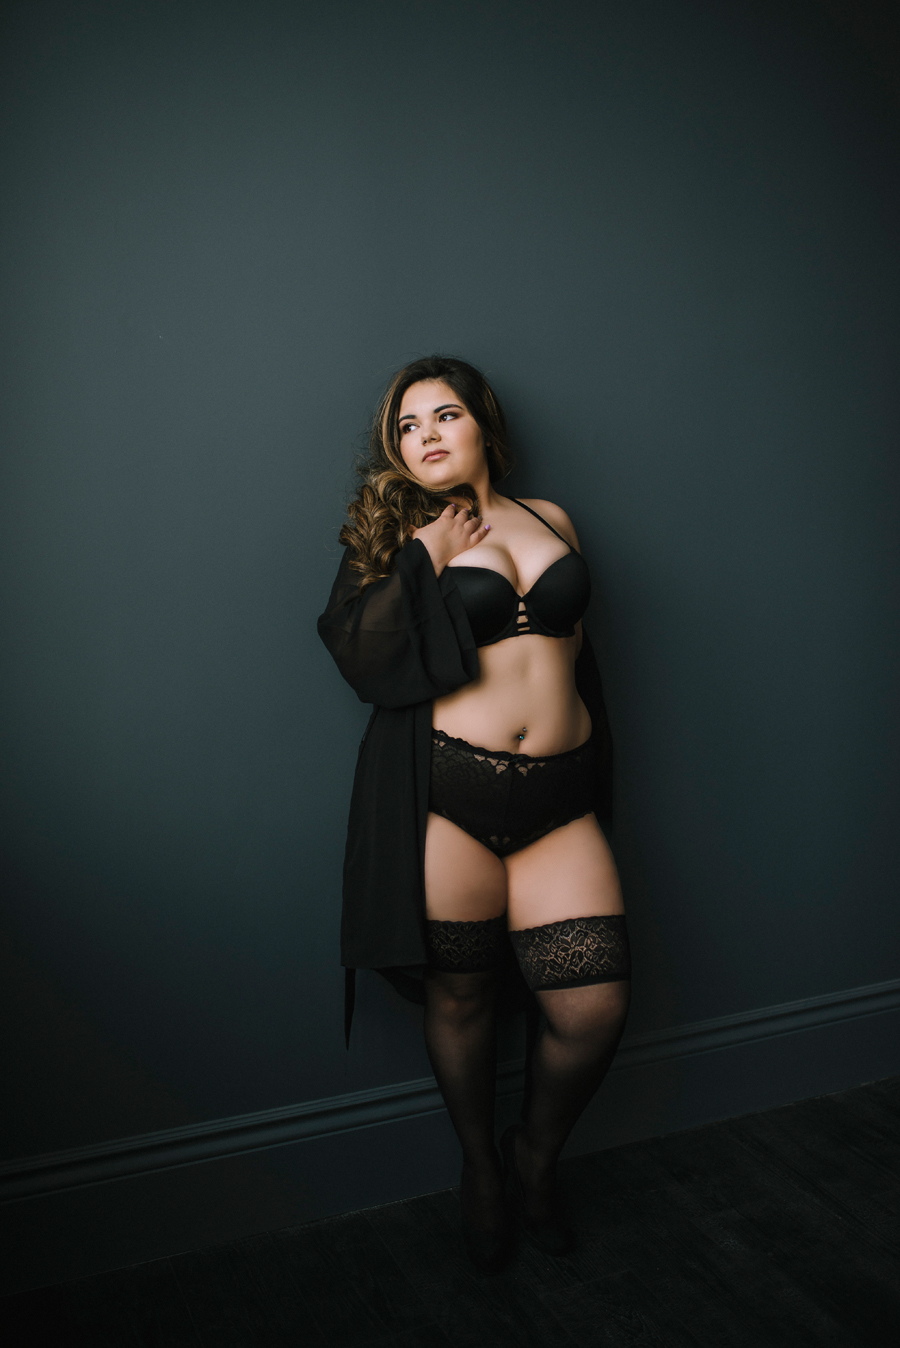 boudoir photographer toronto